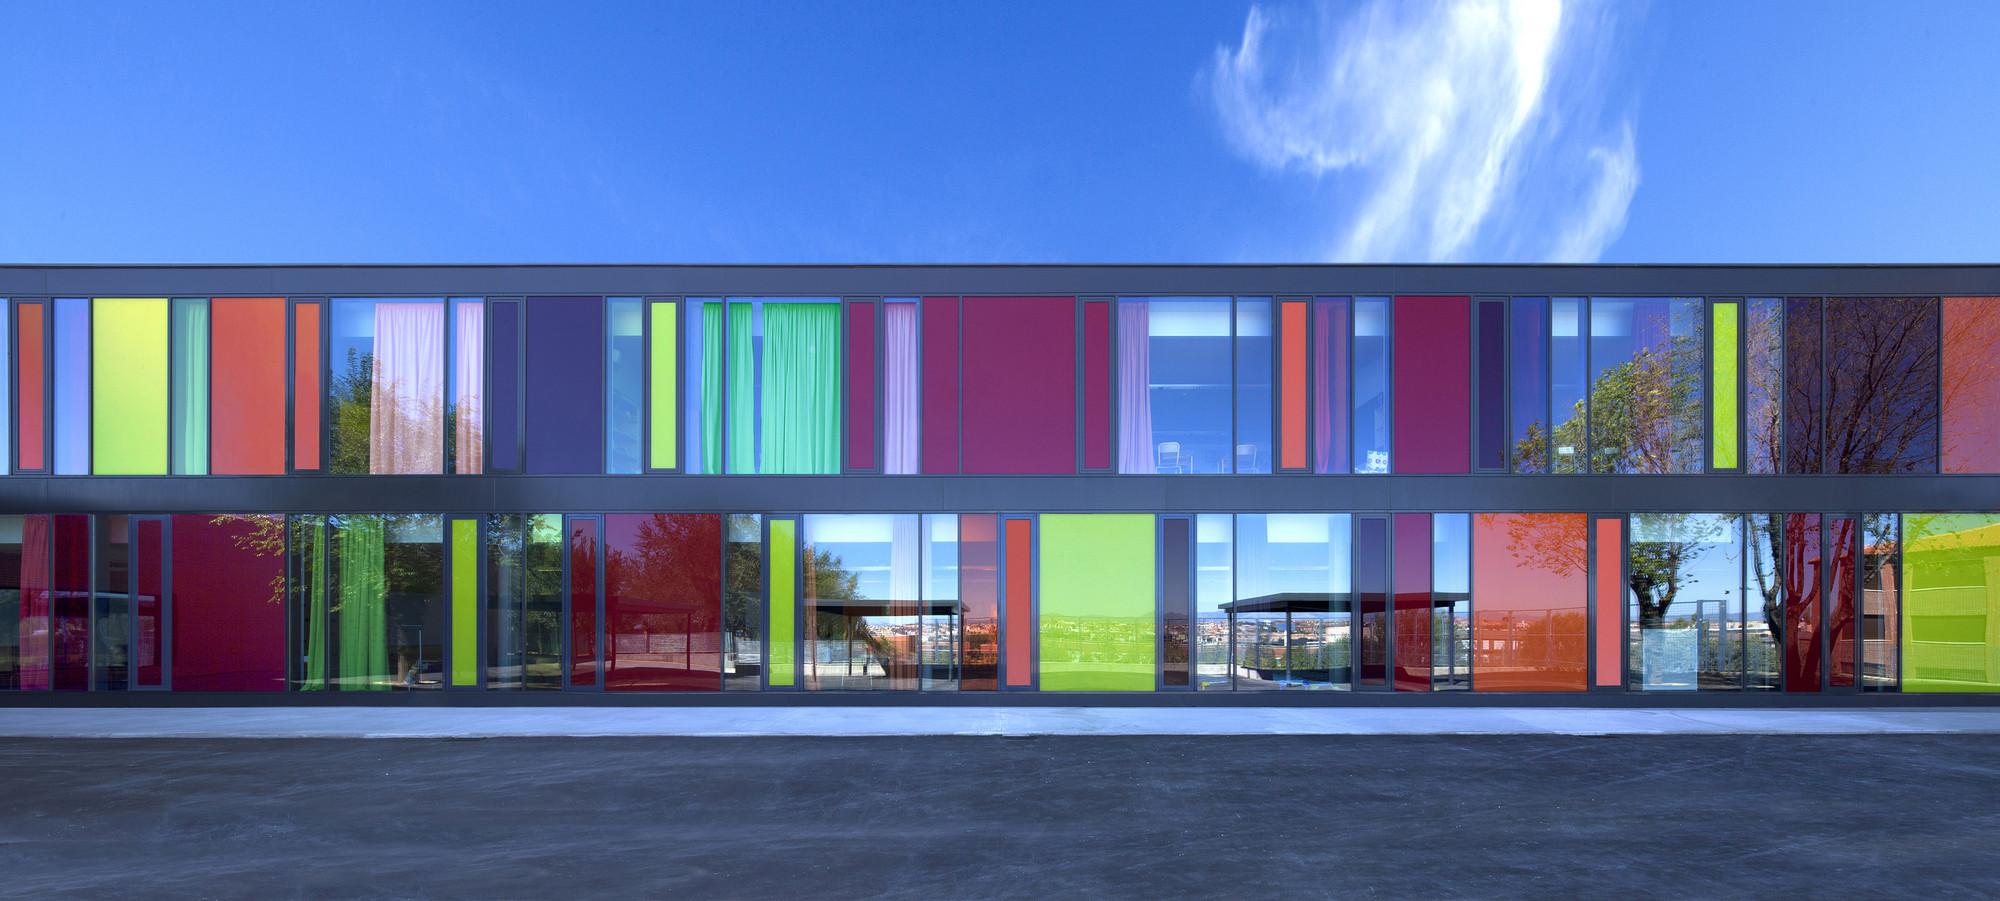 Archivo: Arquitectura Multicolor / Parte 2